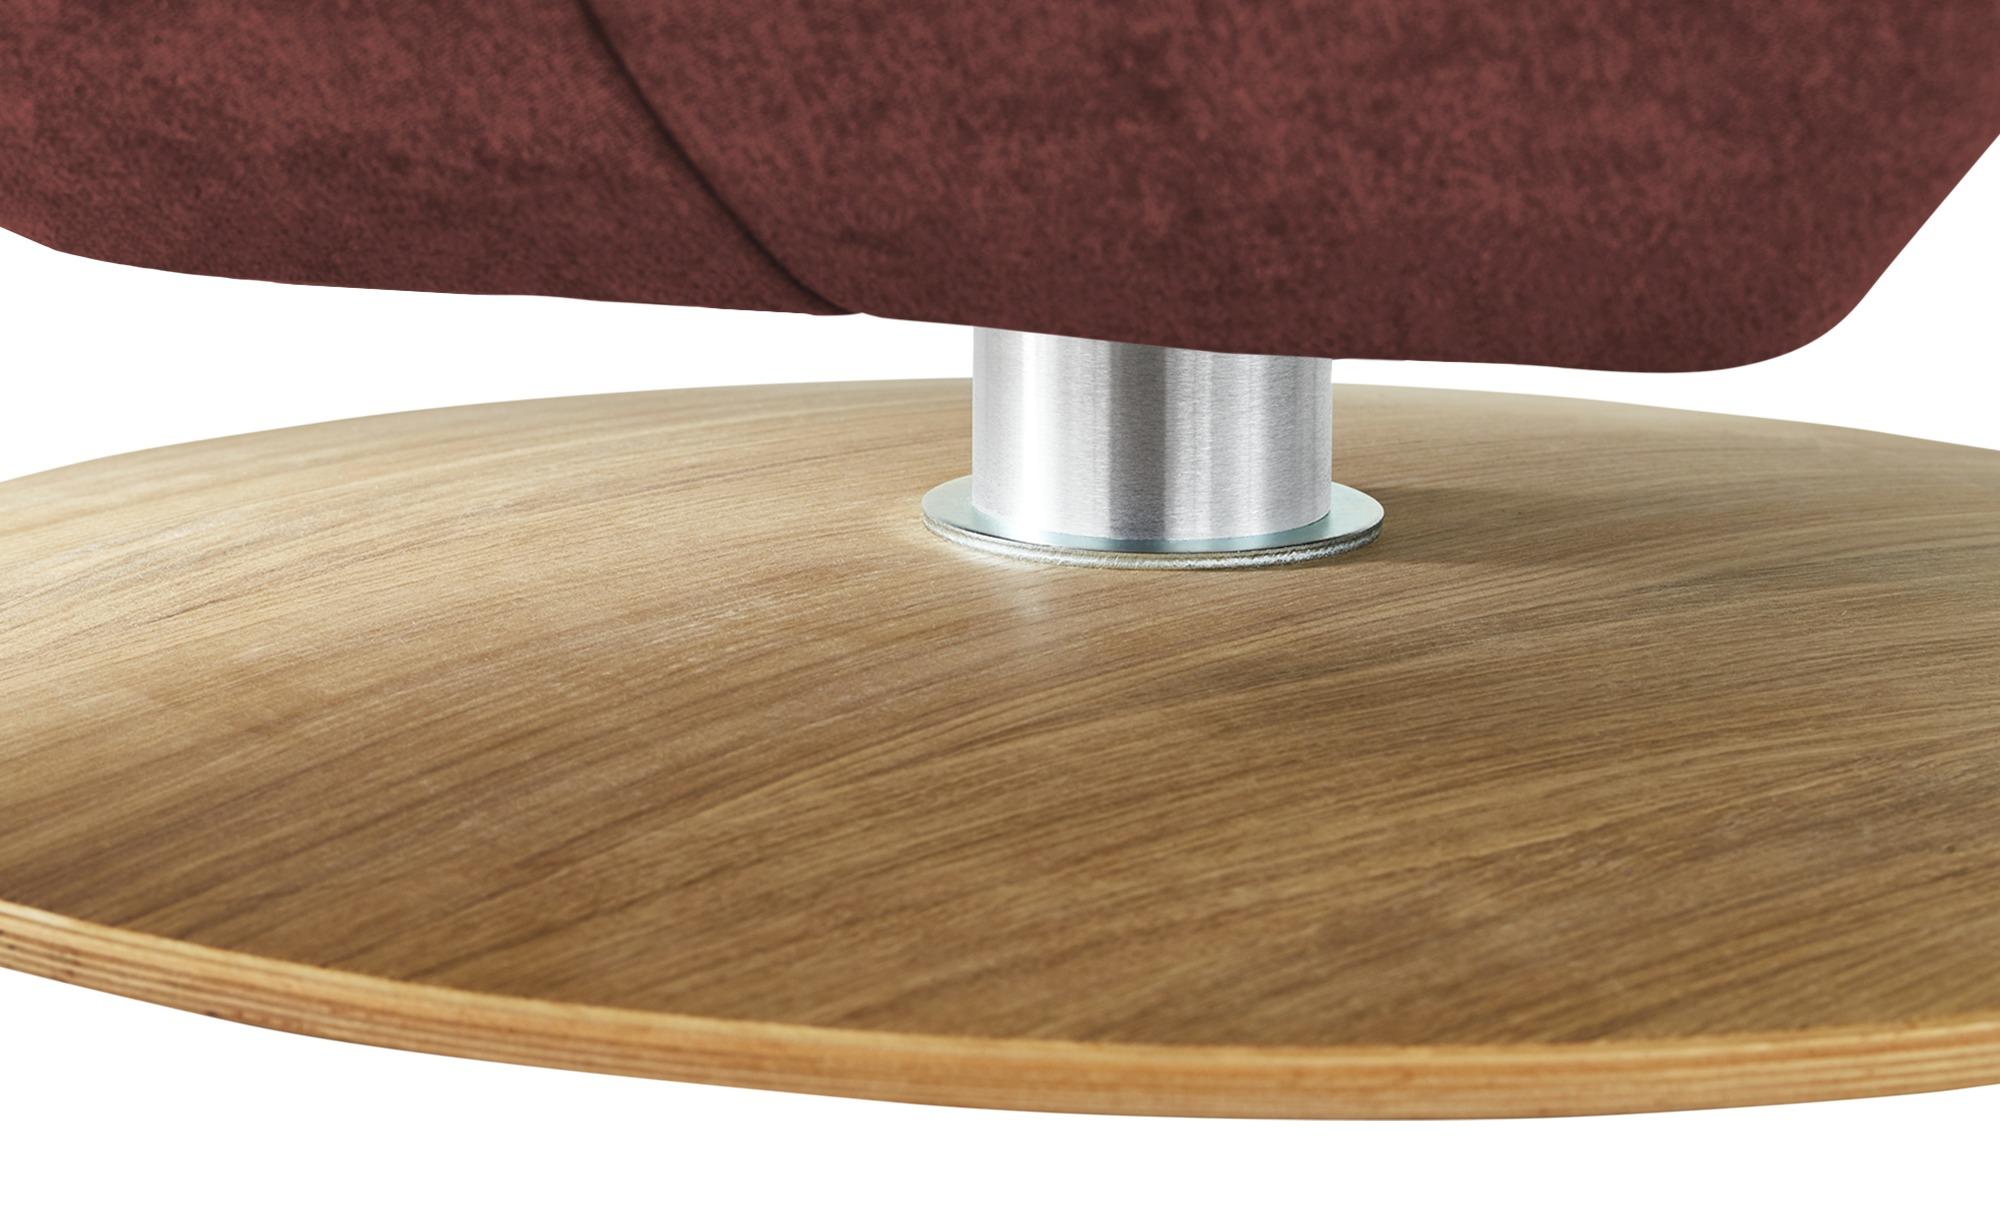 Nils Olsen Relaxsessel  Arend ¦ rot ¦ Maße (cm): B: 74 H: 110 T: 80 Polstermöbel > Sessel > Fernsehsessel - Höffner